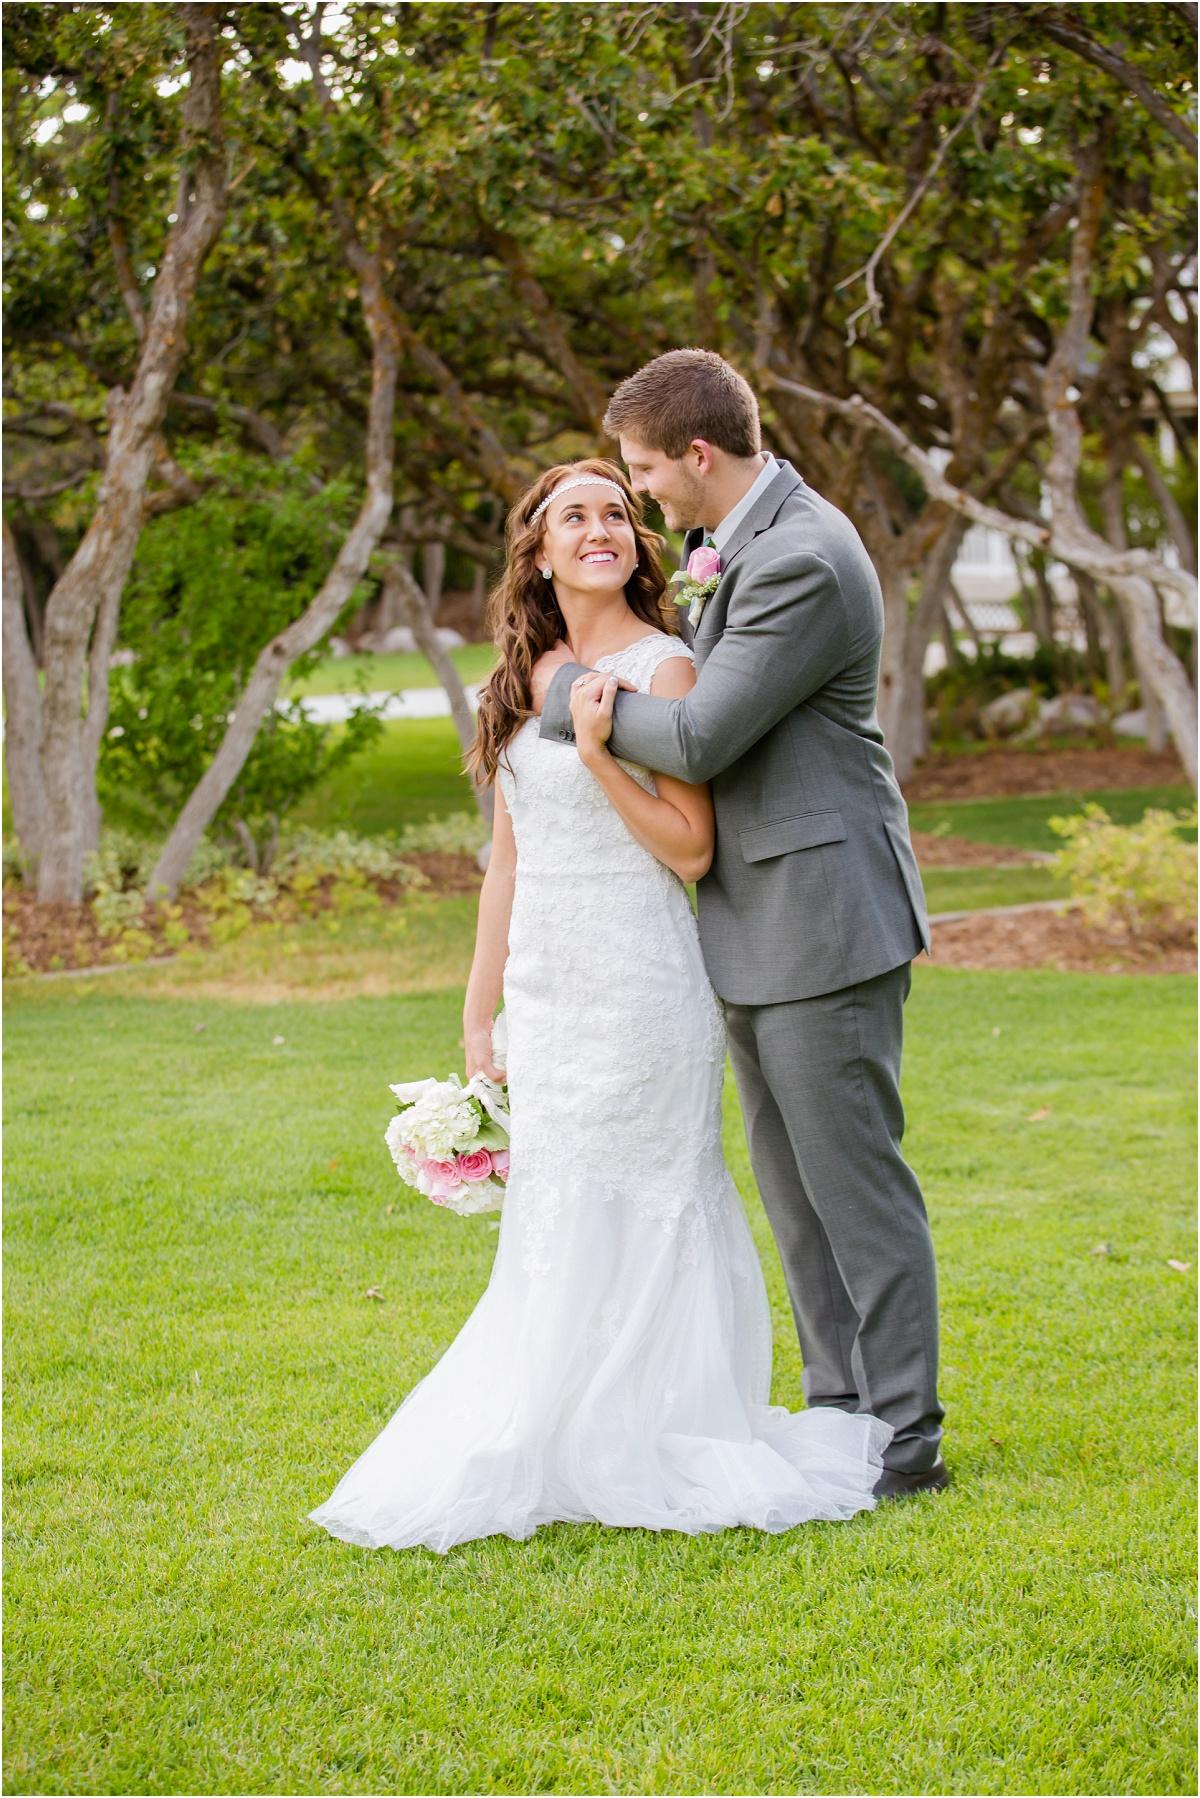 Davis County Private Venue Wedding Terra Cooper Photography_3491.jpg